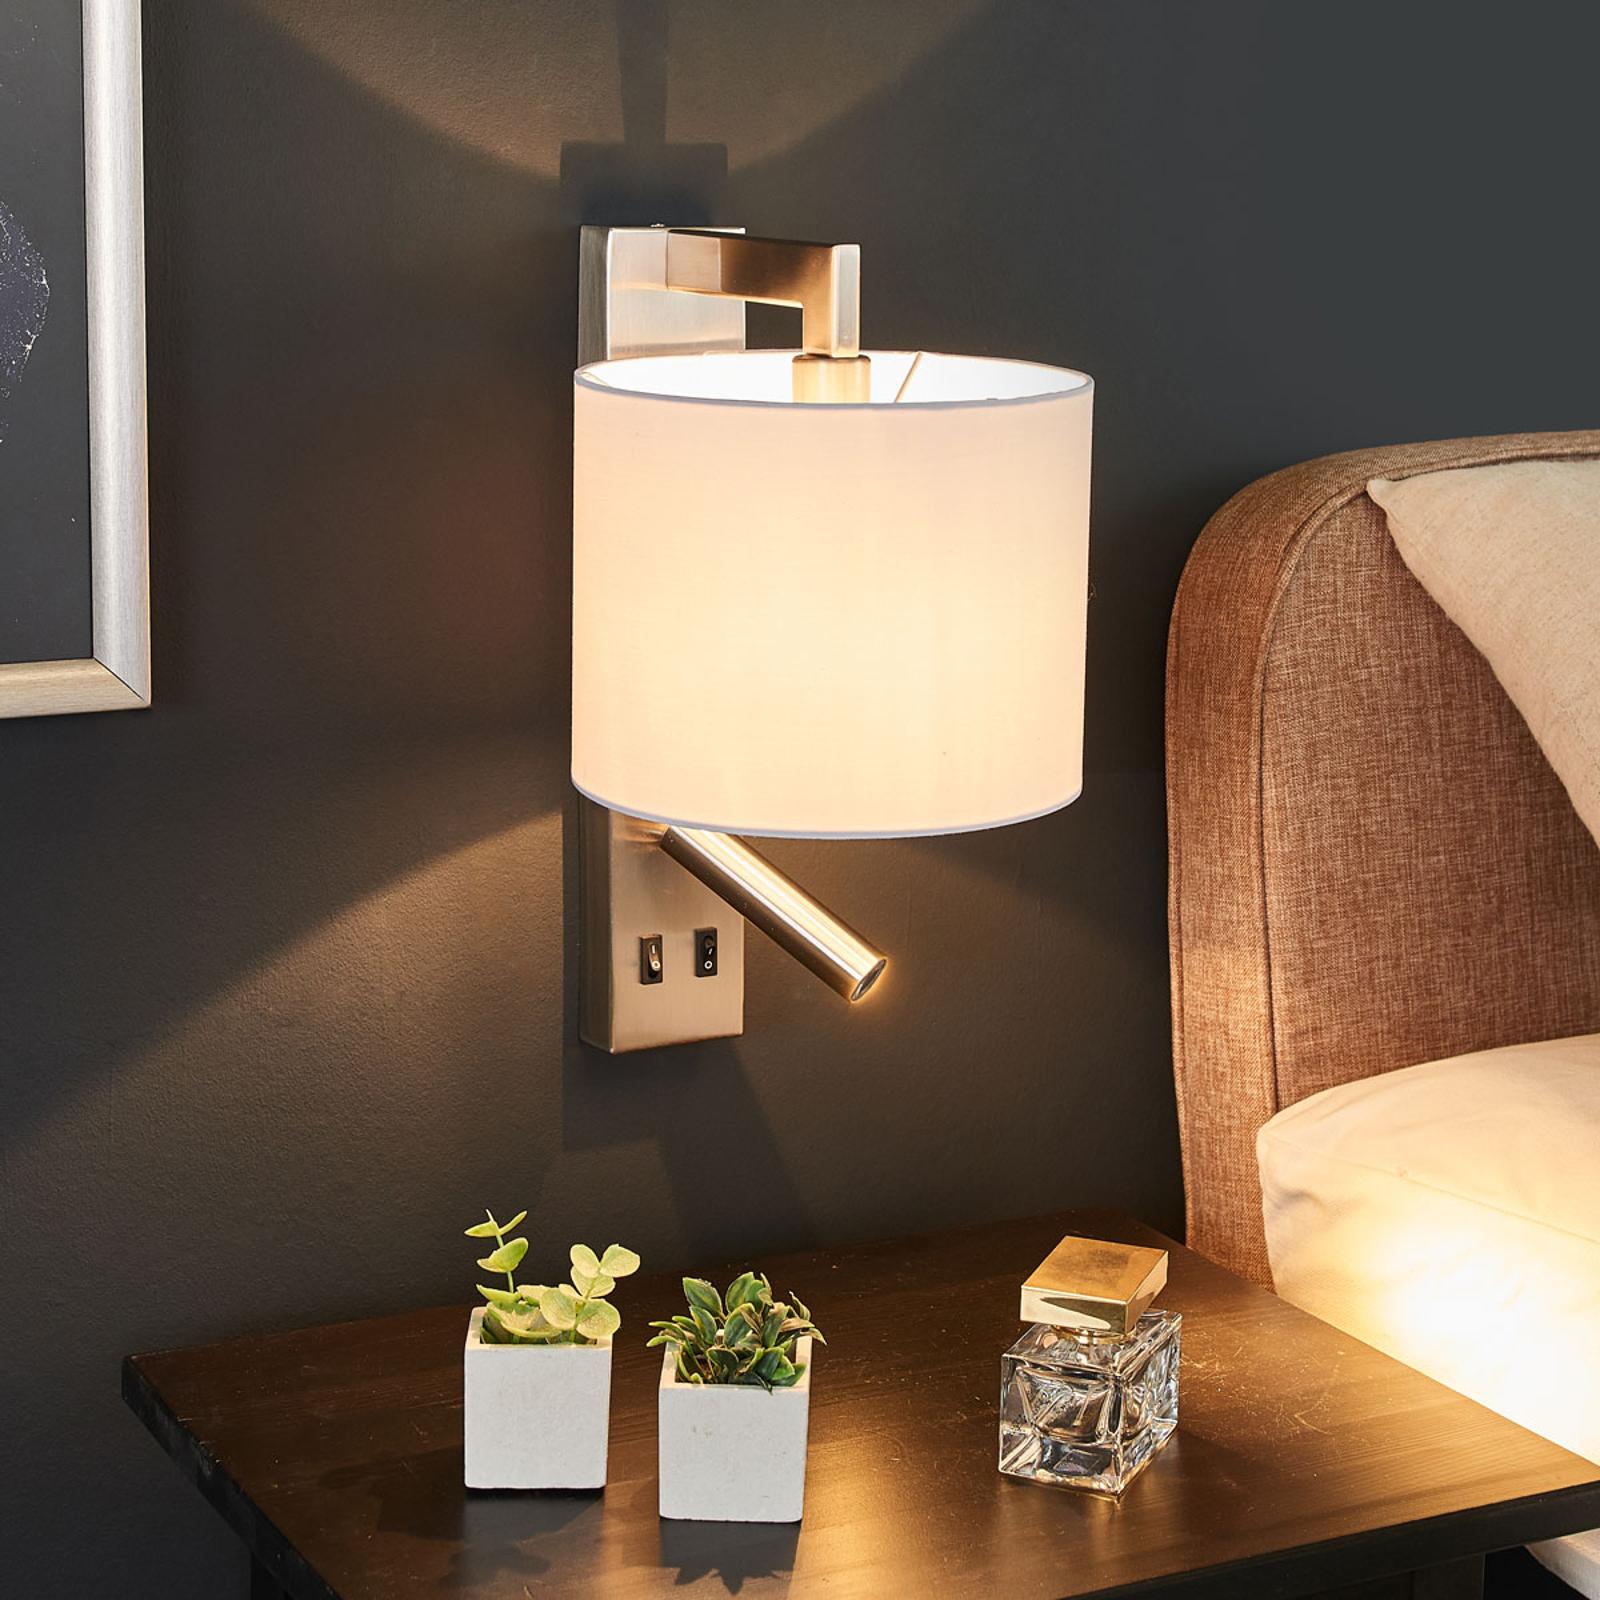 Witte wandlamp Mavis met LED leeslampje